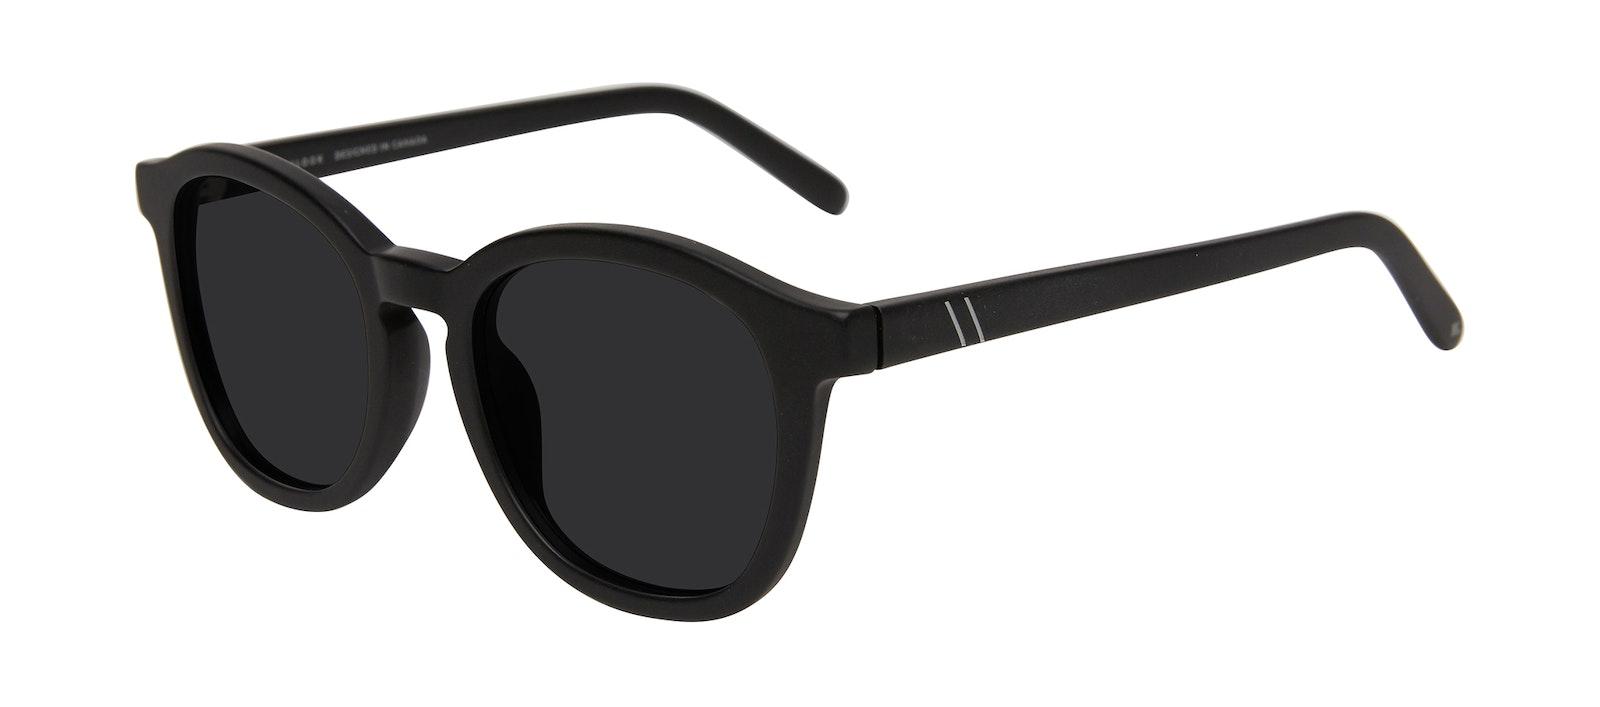 Affordable Fashion Glasses Round Sunglasses Men Script Matte Black Tilt